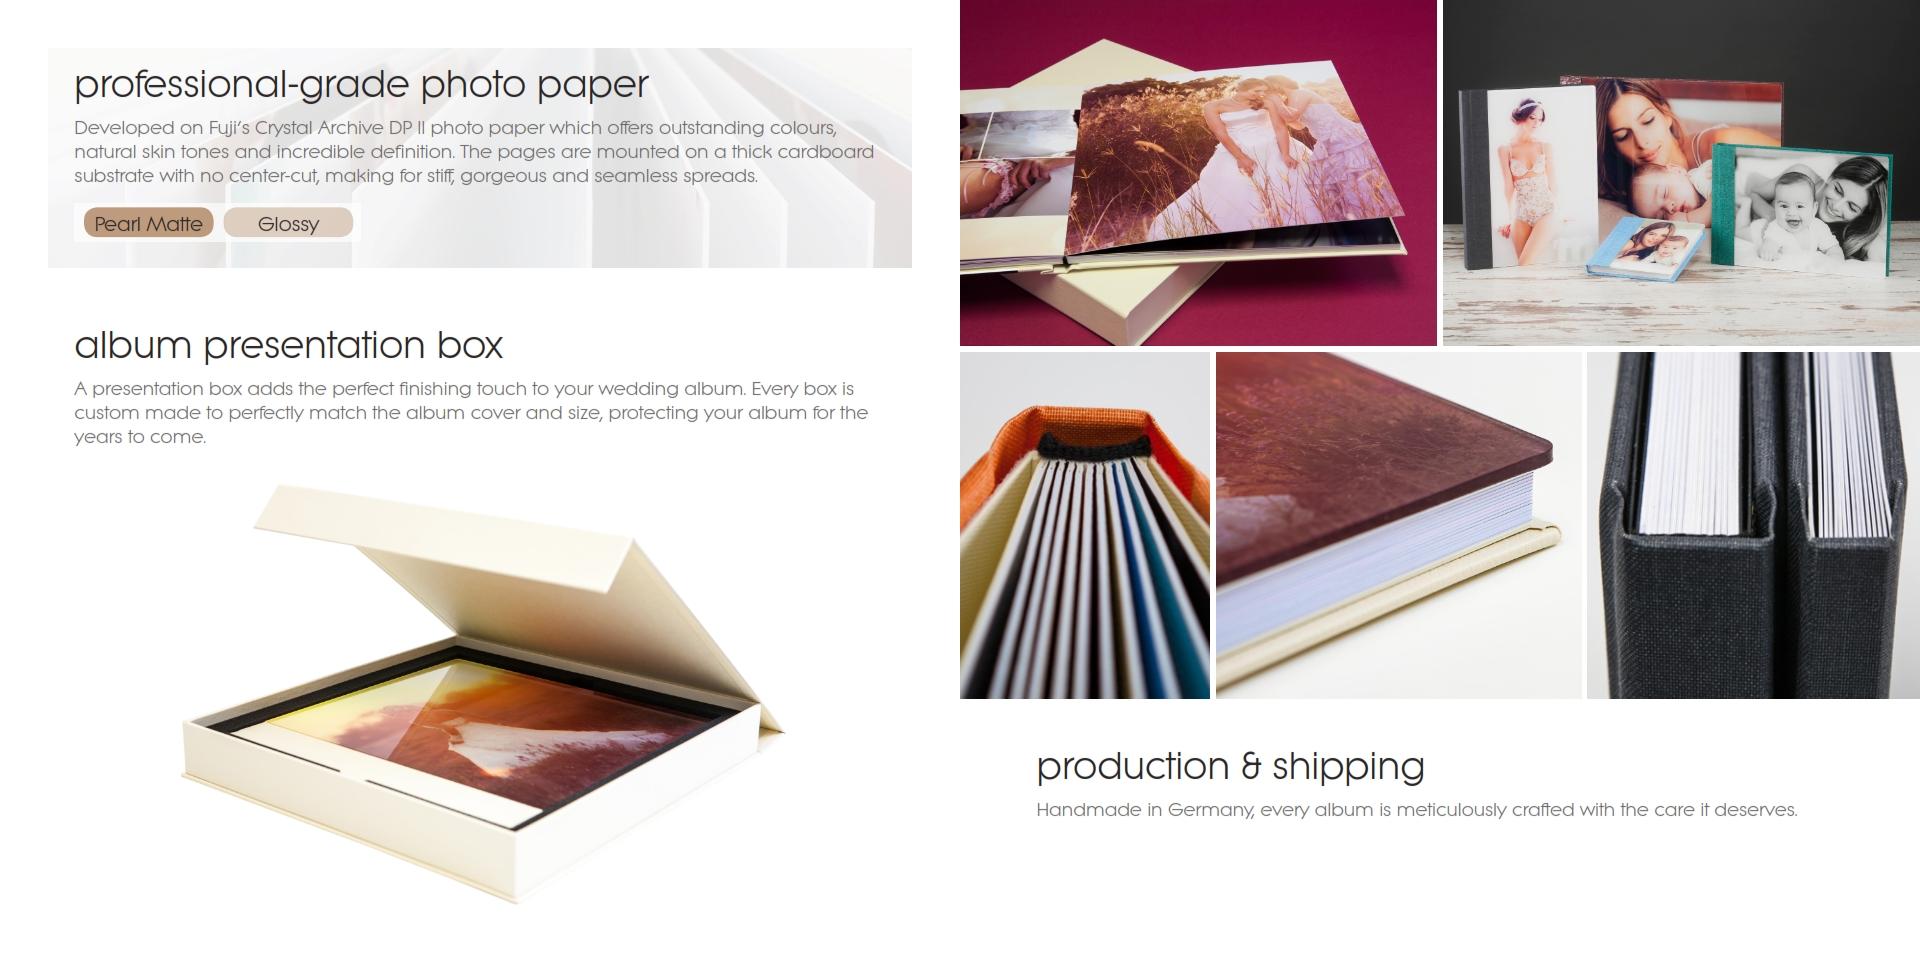 PIkPerfect Brochure-no shipping (1)_006.jpg